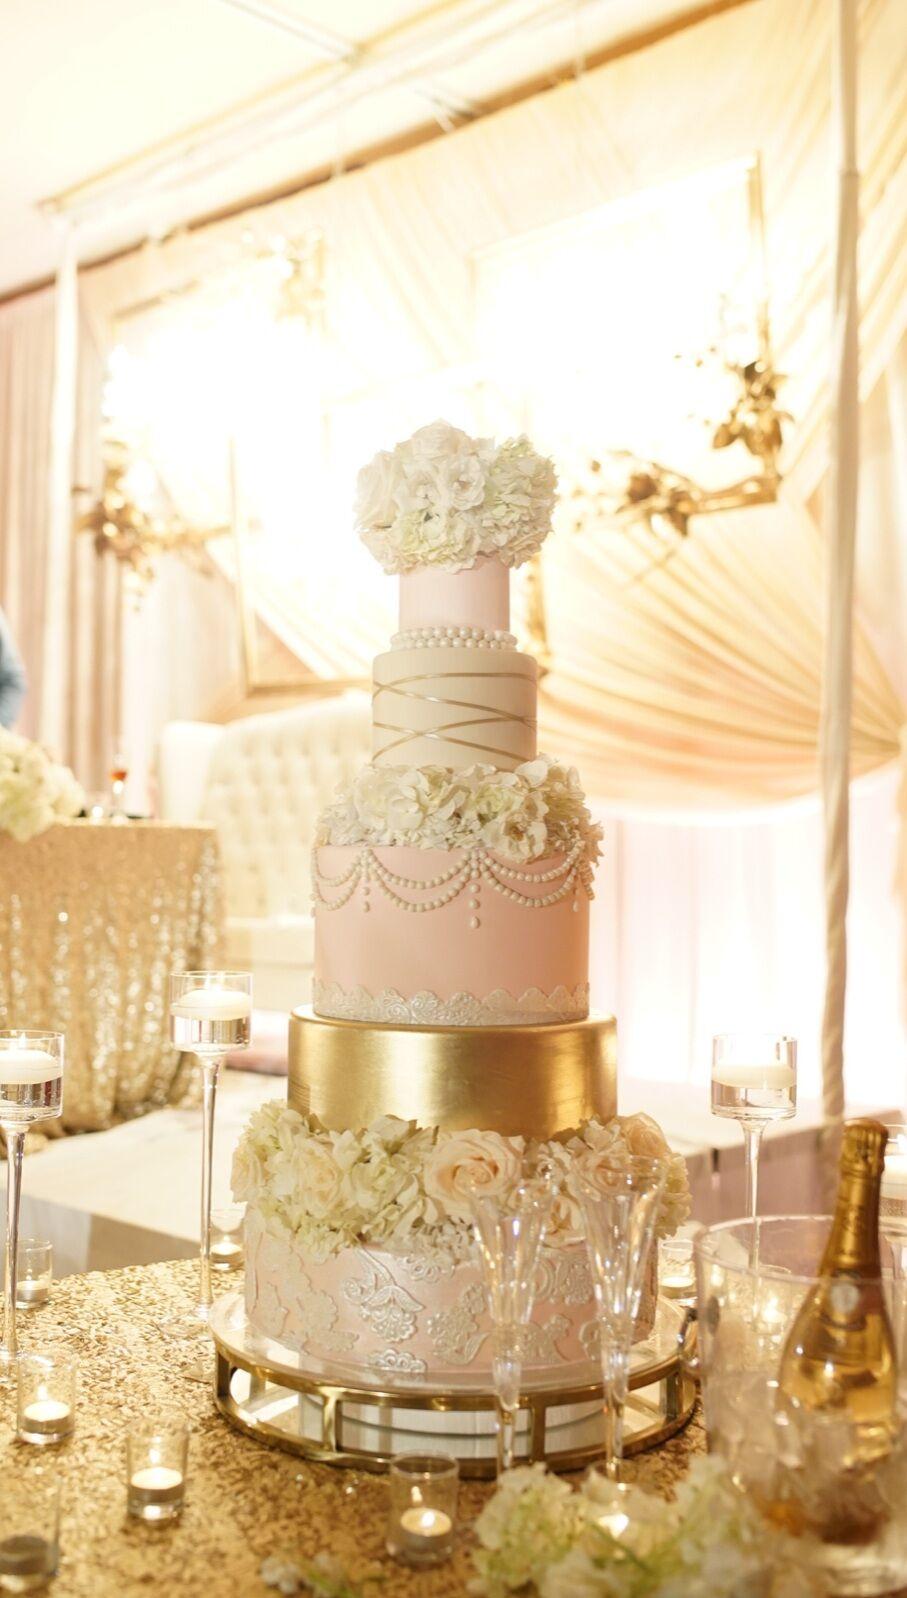 Wedding Cake Bakeries in Huntington Beach, CA - The Knot